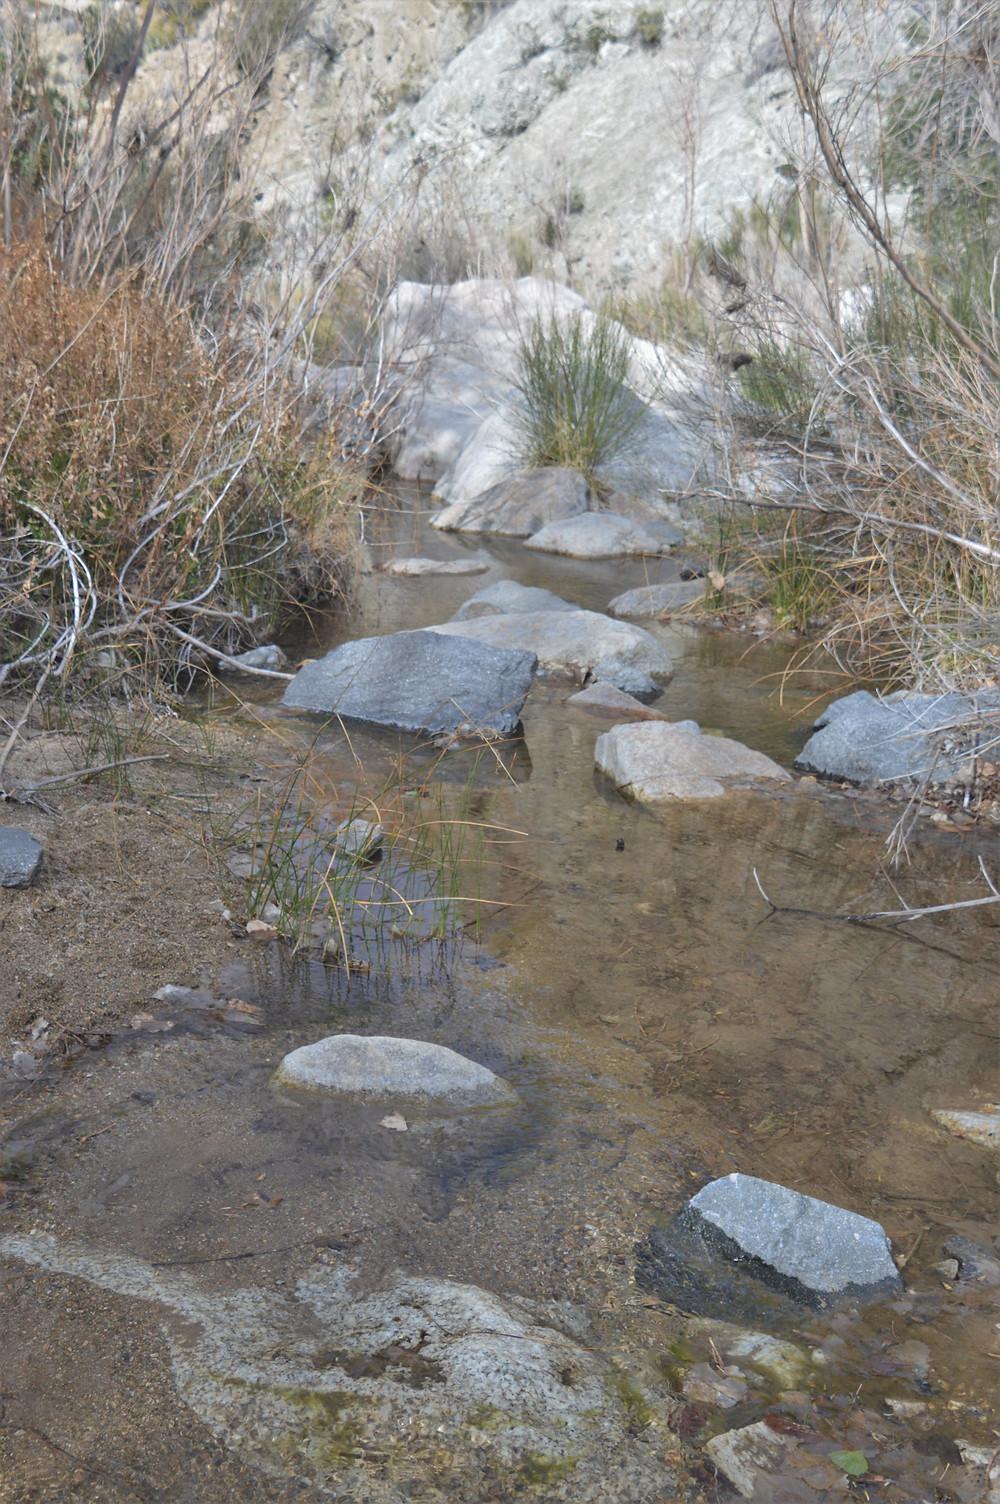 Horsethief Creek in the Santa Rosa Wilderness